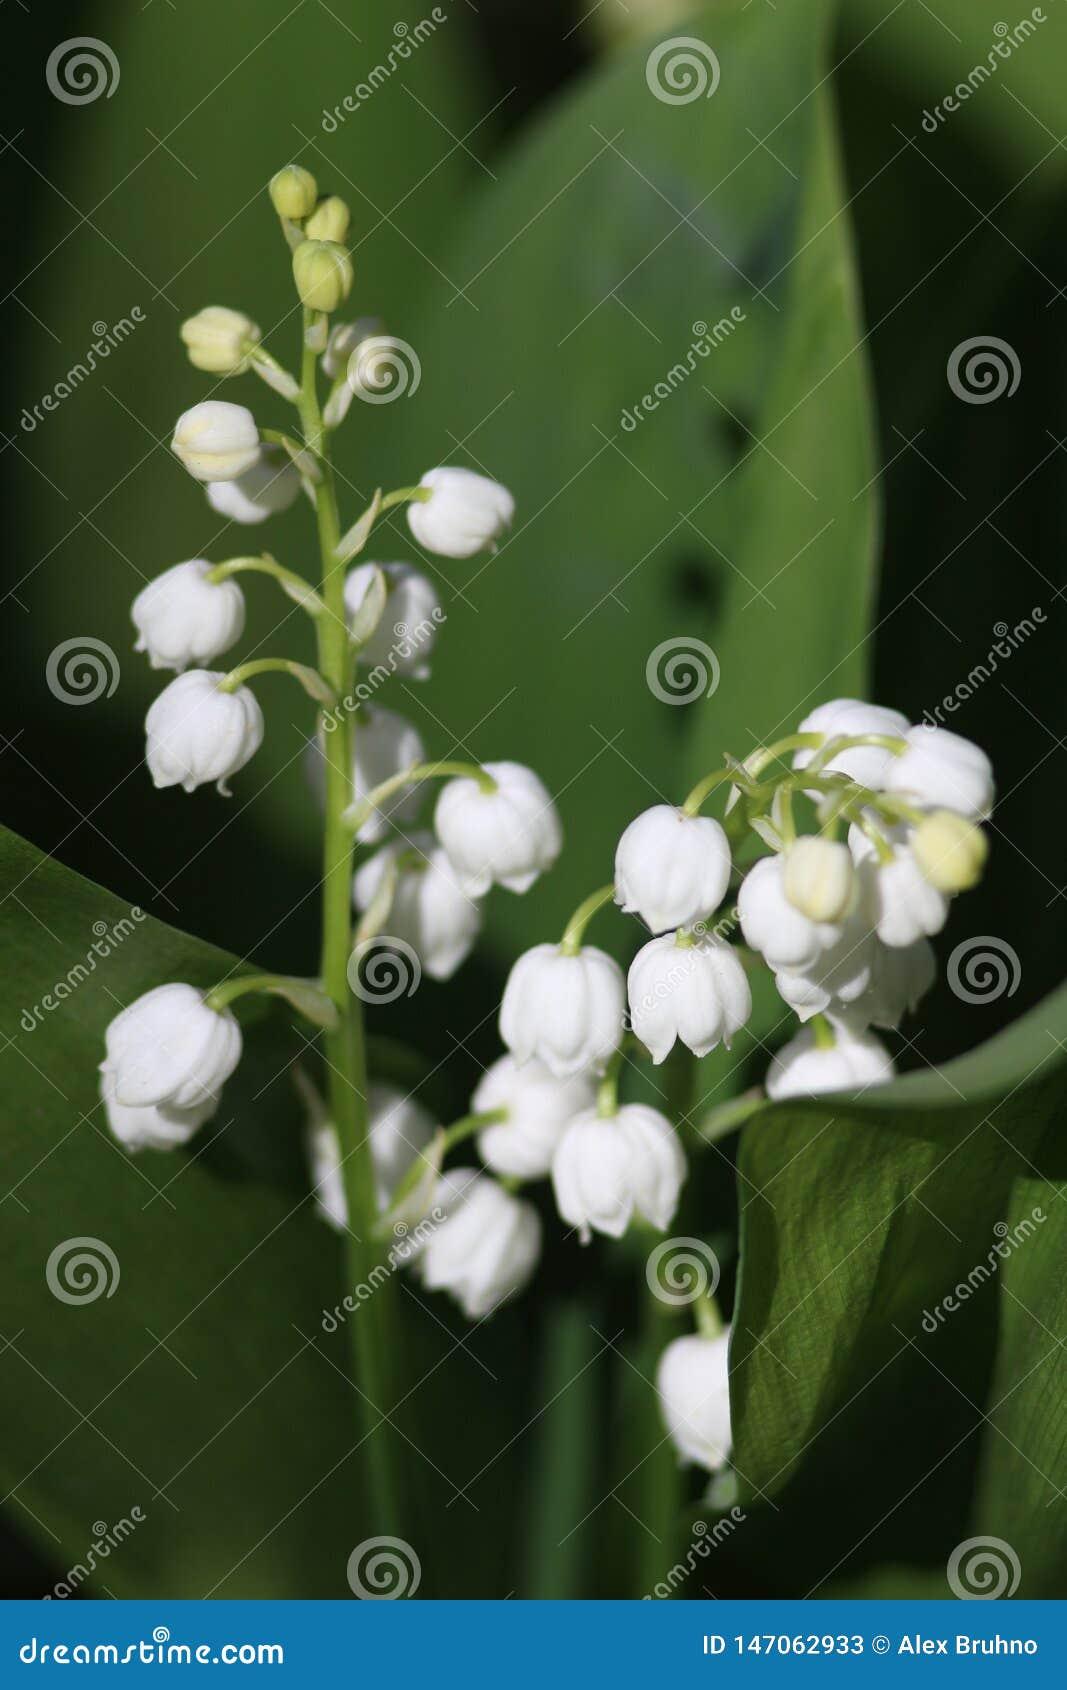 O κρίνος λουλουδιών της κοιλάδας κρίνοι άνθισης της κοιλάδας άσπρα λουλούδια σε ένα πράσινο υπόβαθρο κουδούνι